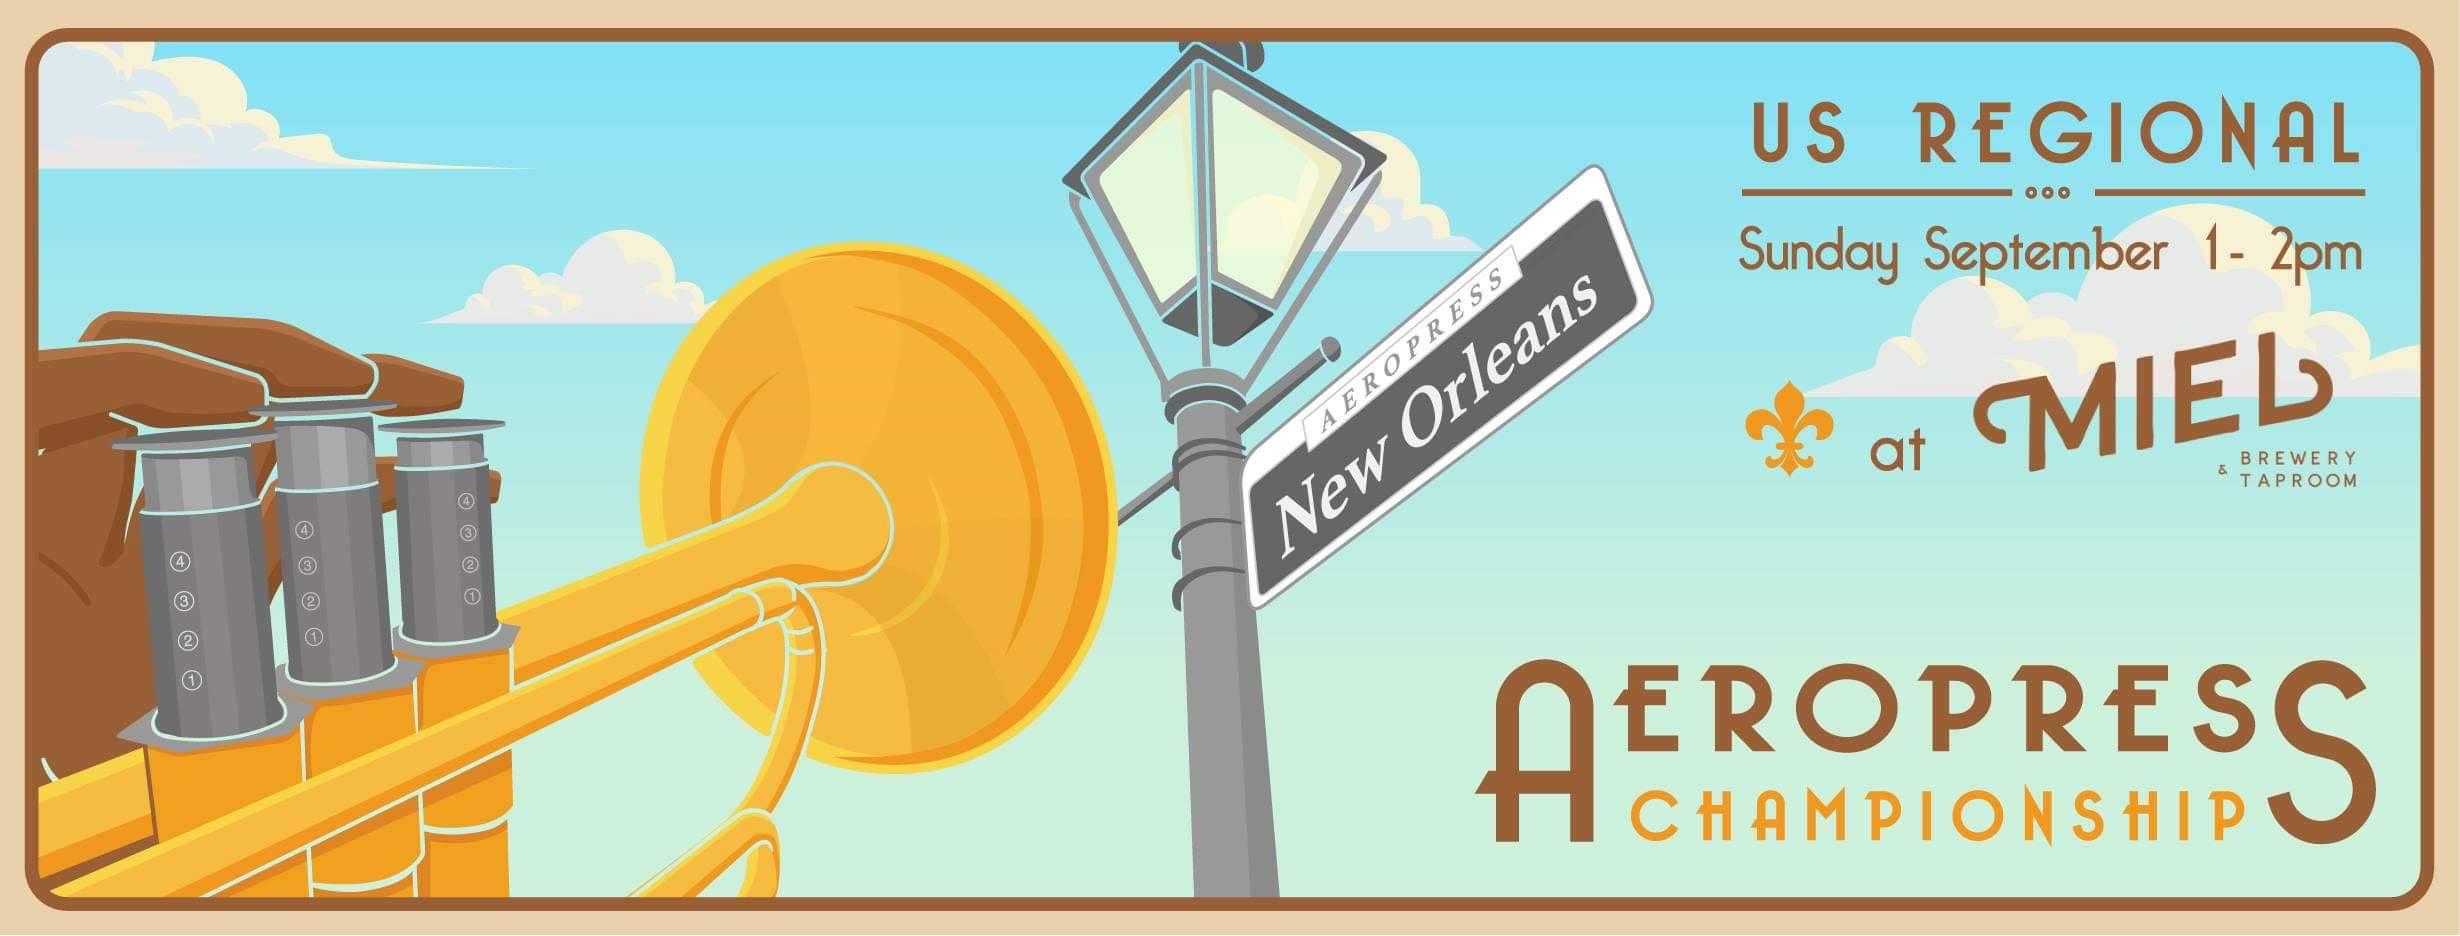 Miel Brewery_New Orleans_NOLA Regional Aeropress Championship